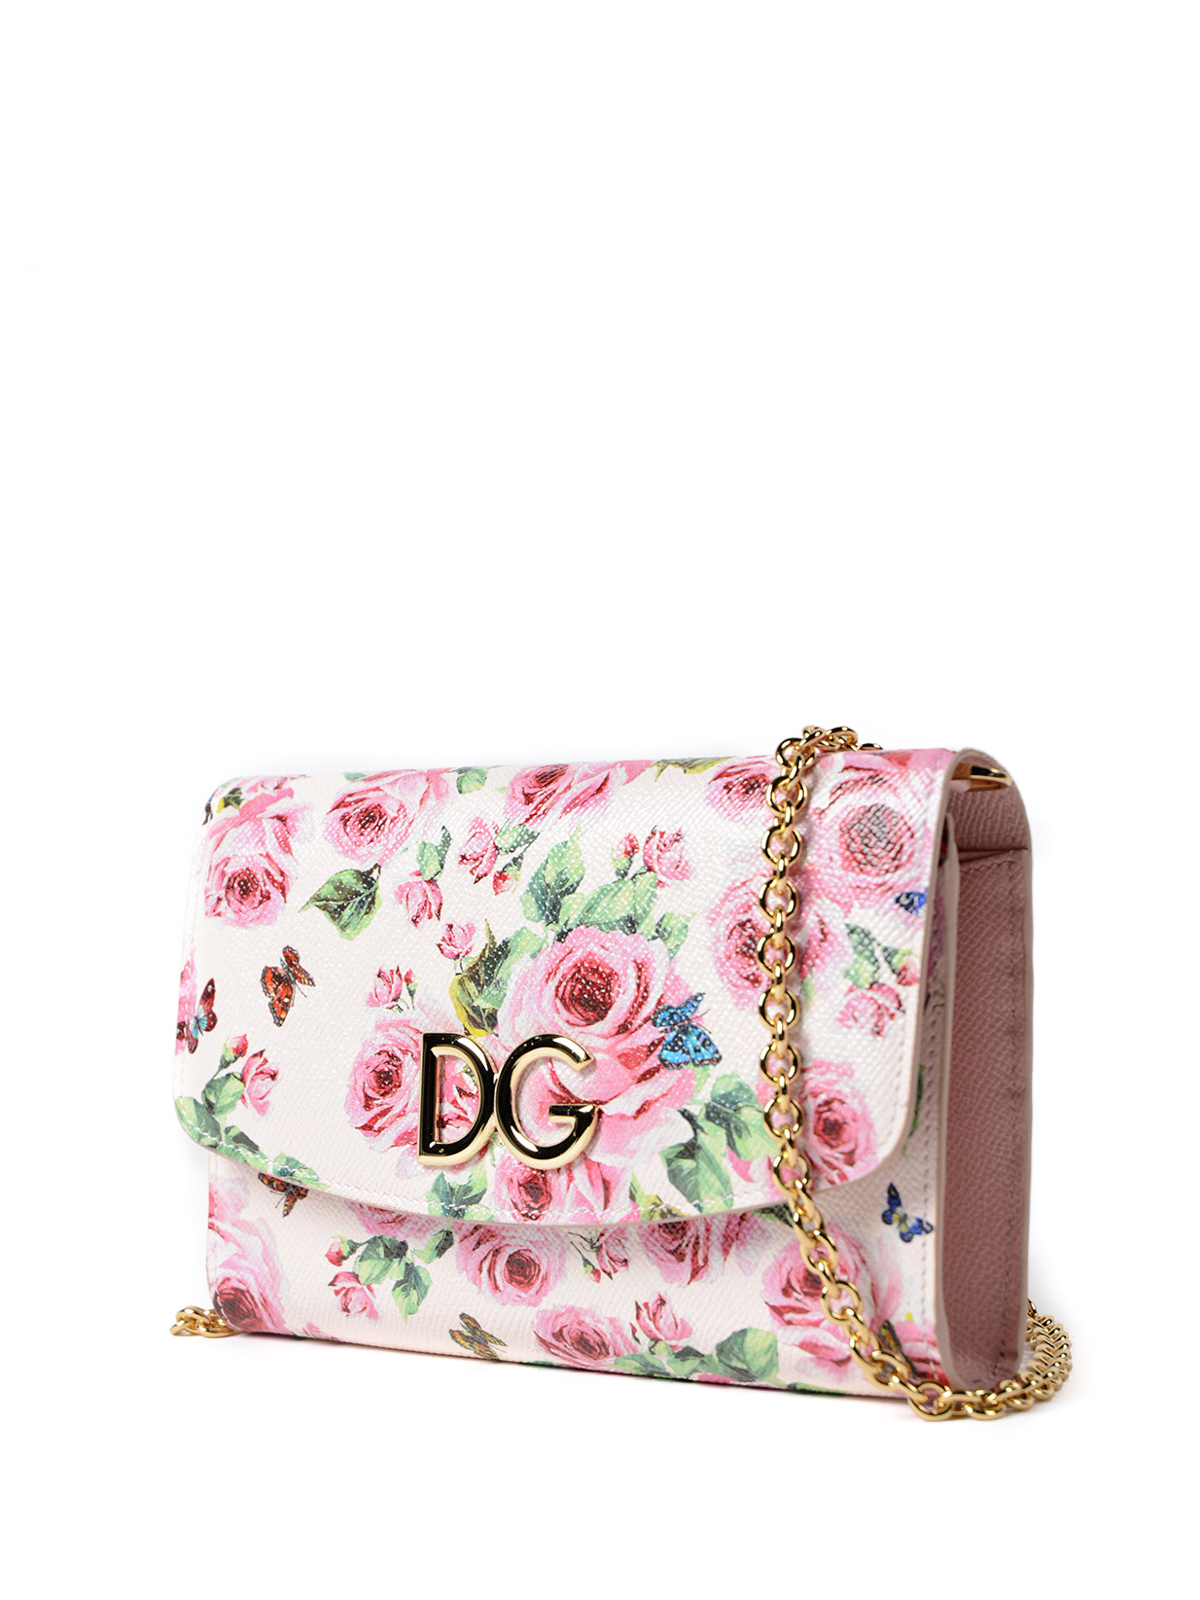 floral print wallet clutch bag Dolce & Gabbana g8LRBsWXS4